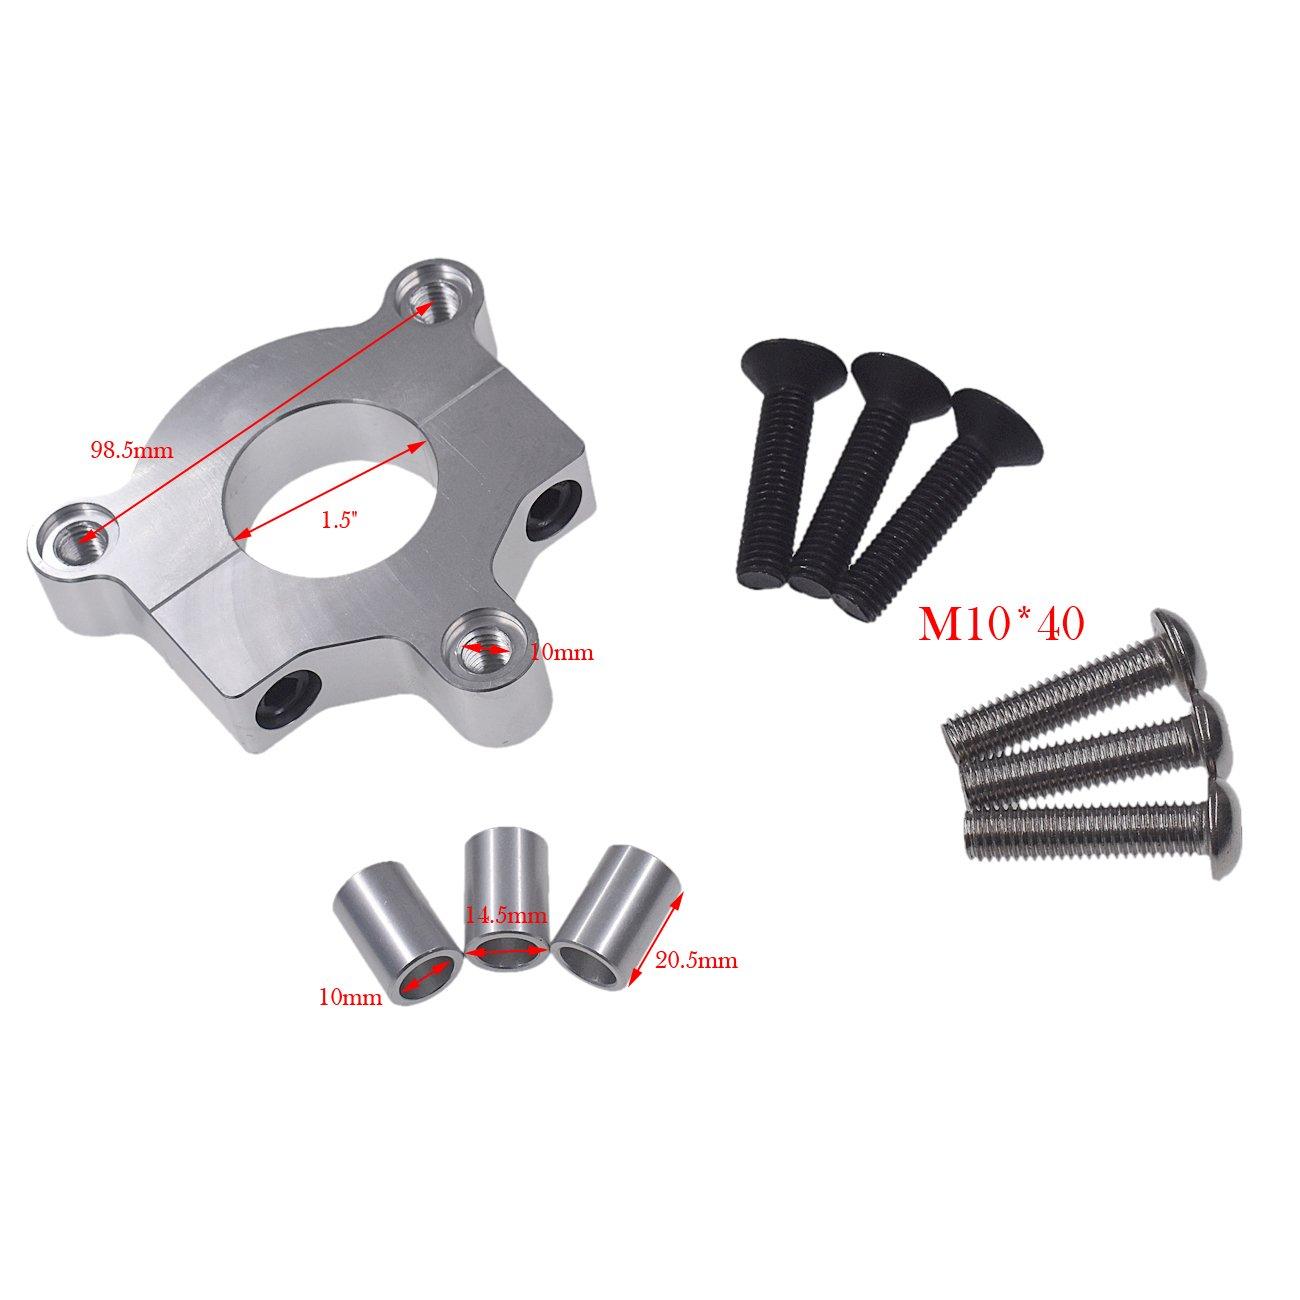 Supermotorparts Black CNC Adapter 44T Sprocket Fits 1 1.5 Hub 66cc 80cc Motorized Bicycle